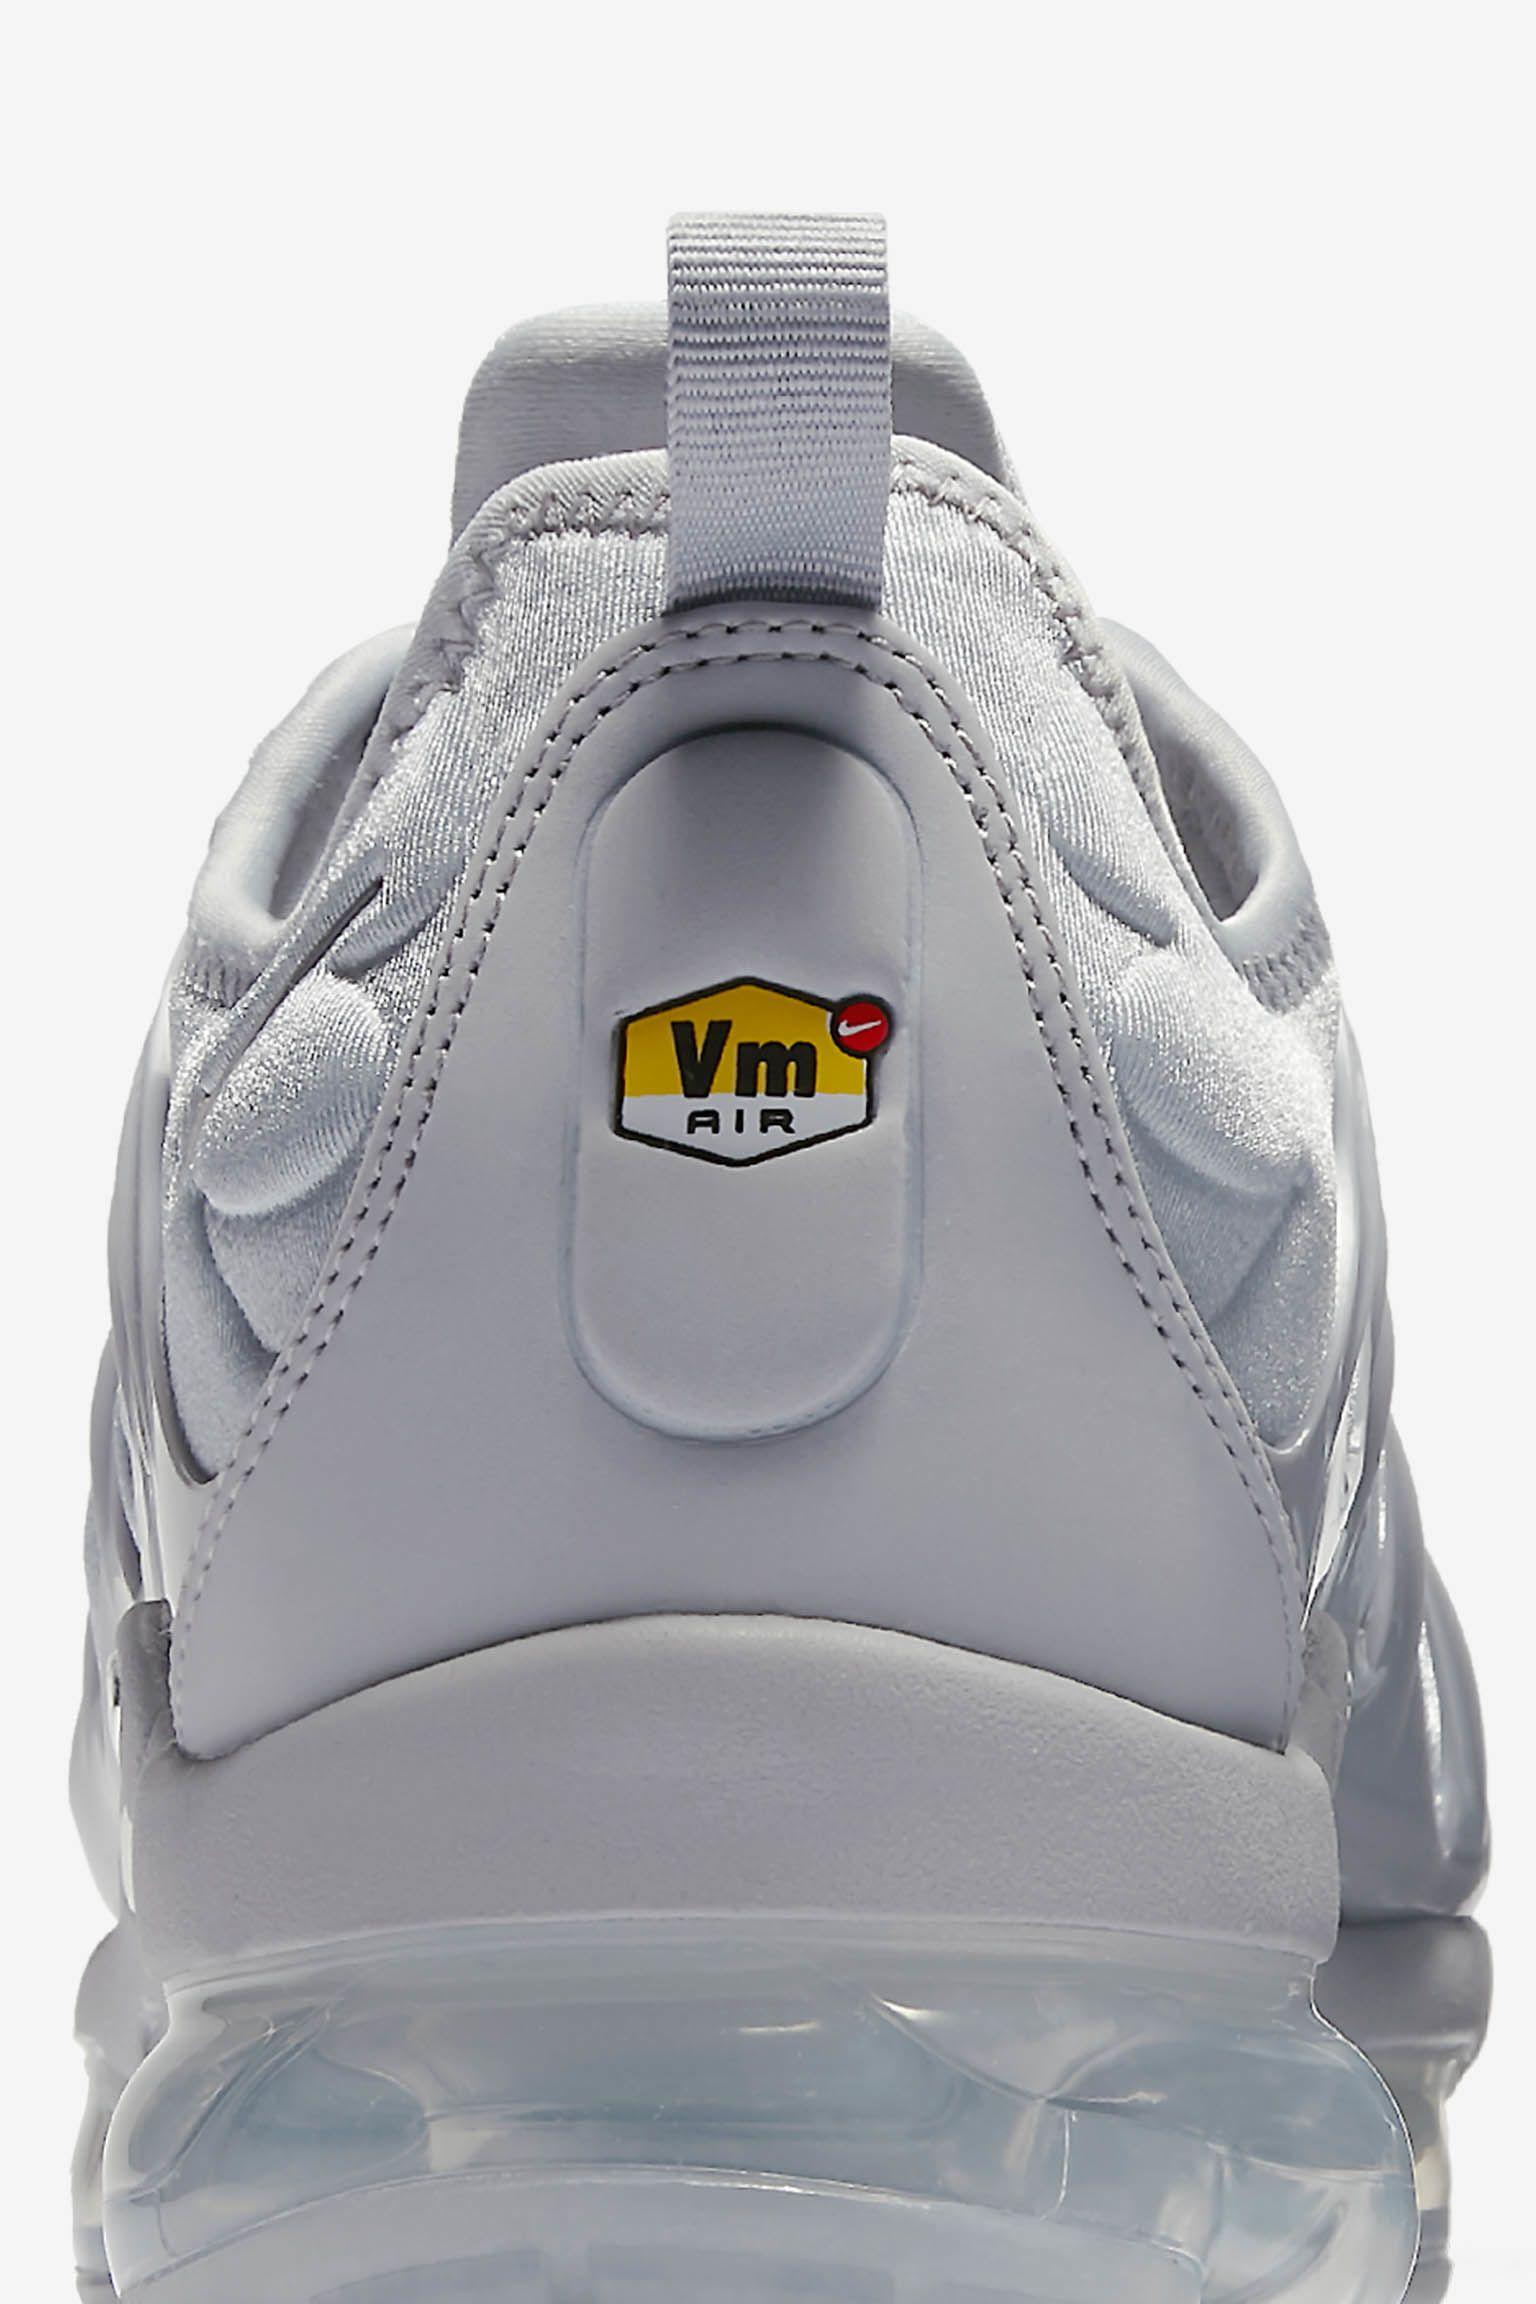 Nike Air Vapormax Plus 'Cool Grey & Metallic Silver' Release Date